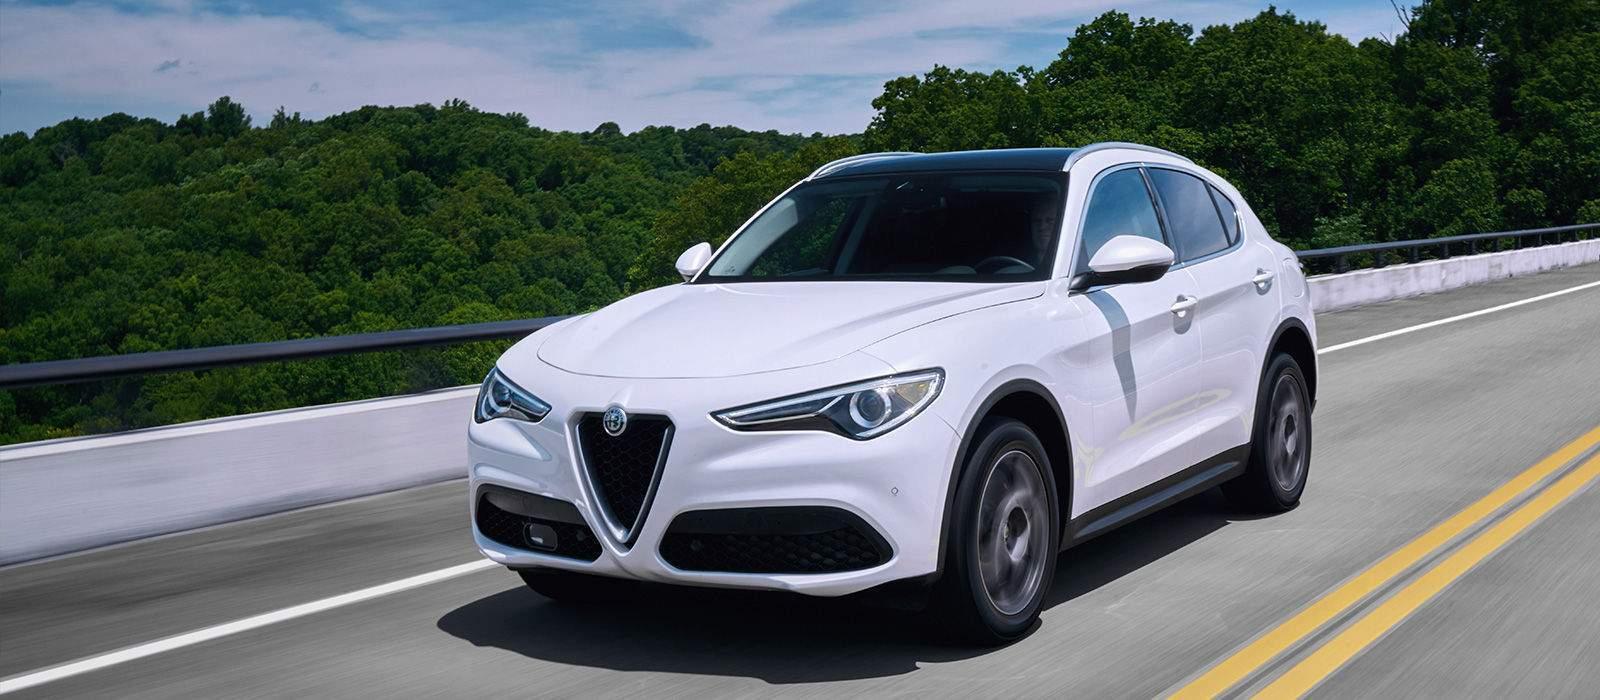 Alfa Romeo Stelvio Ti Alfa Romeo Lease Specials In Westlake An O